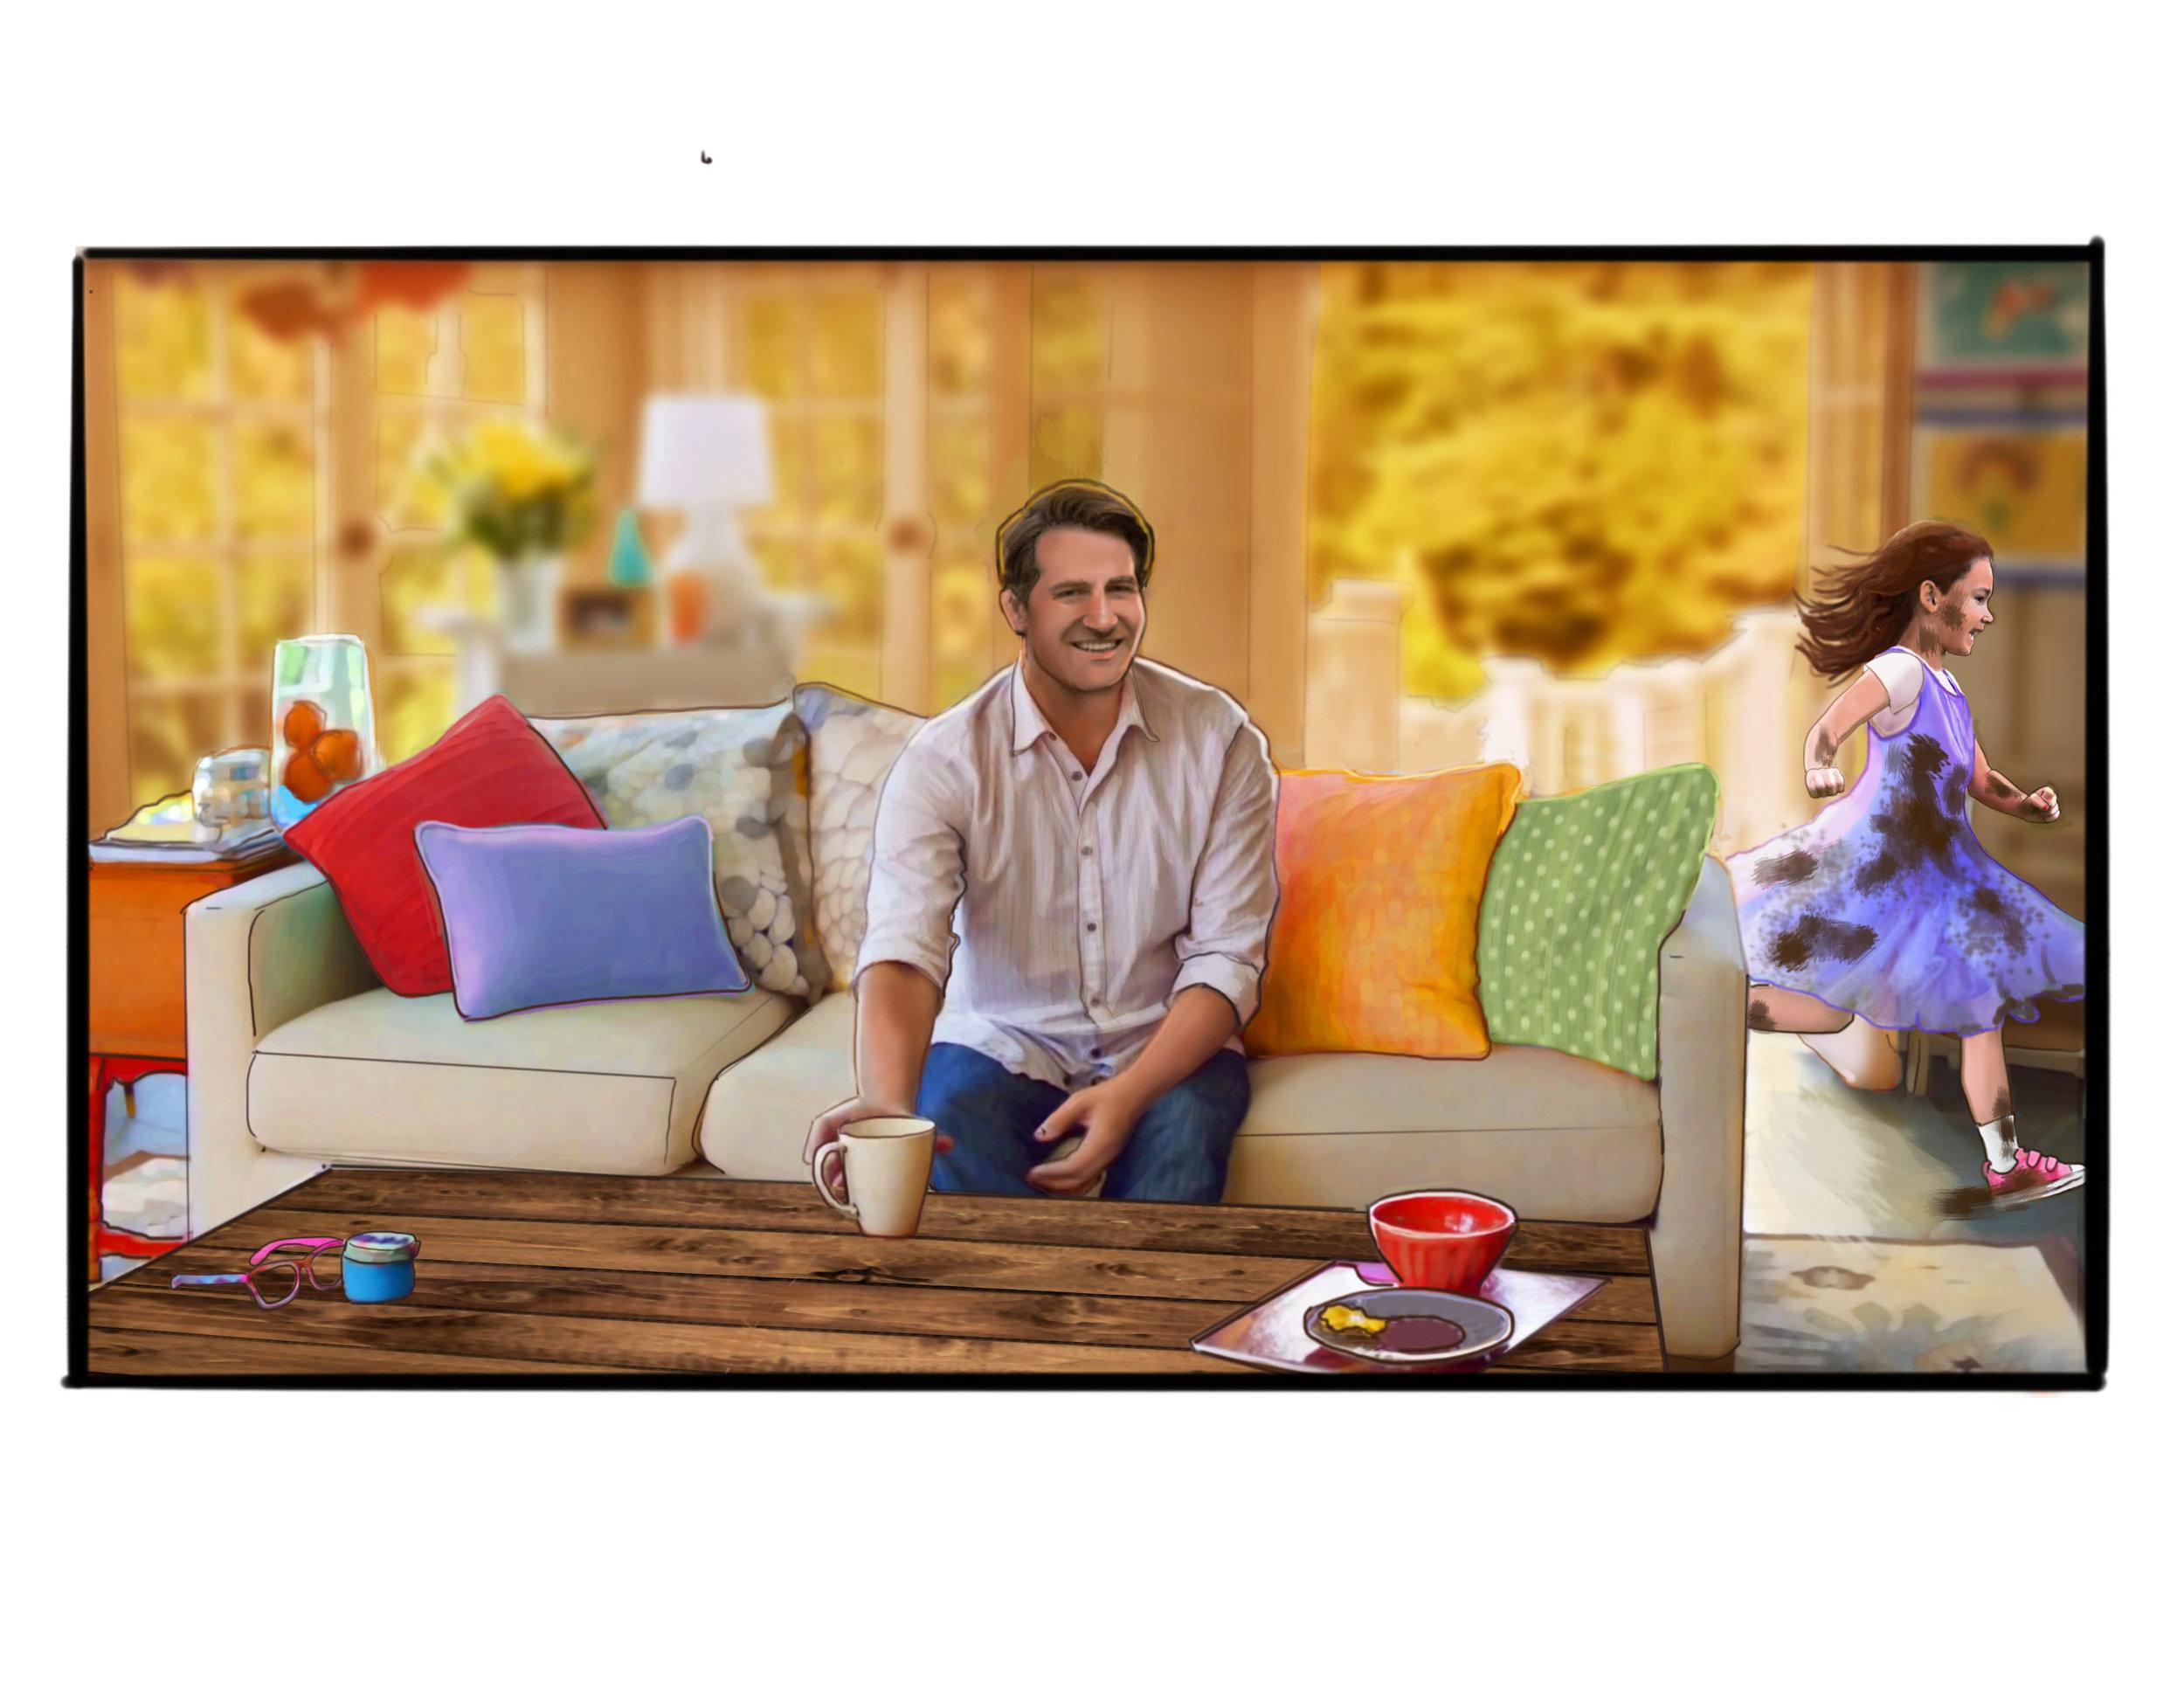 scene couch.jpg